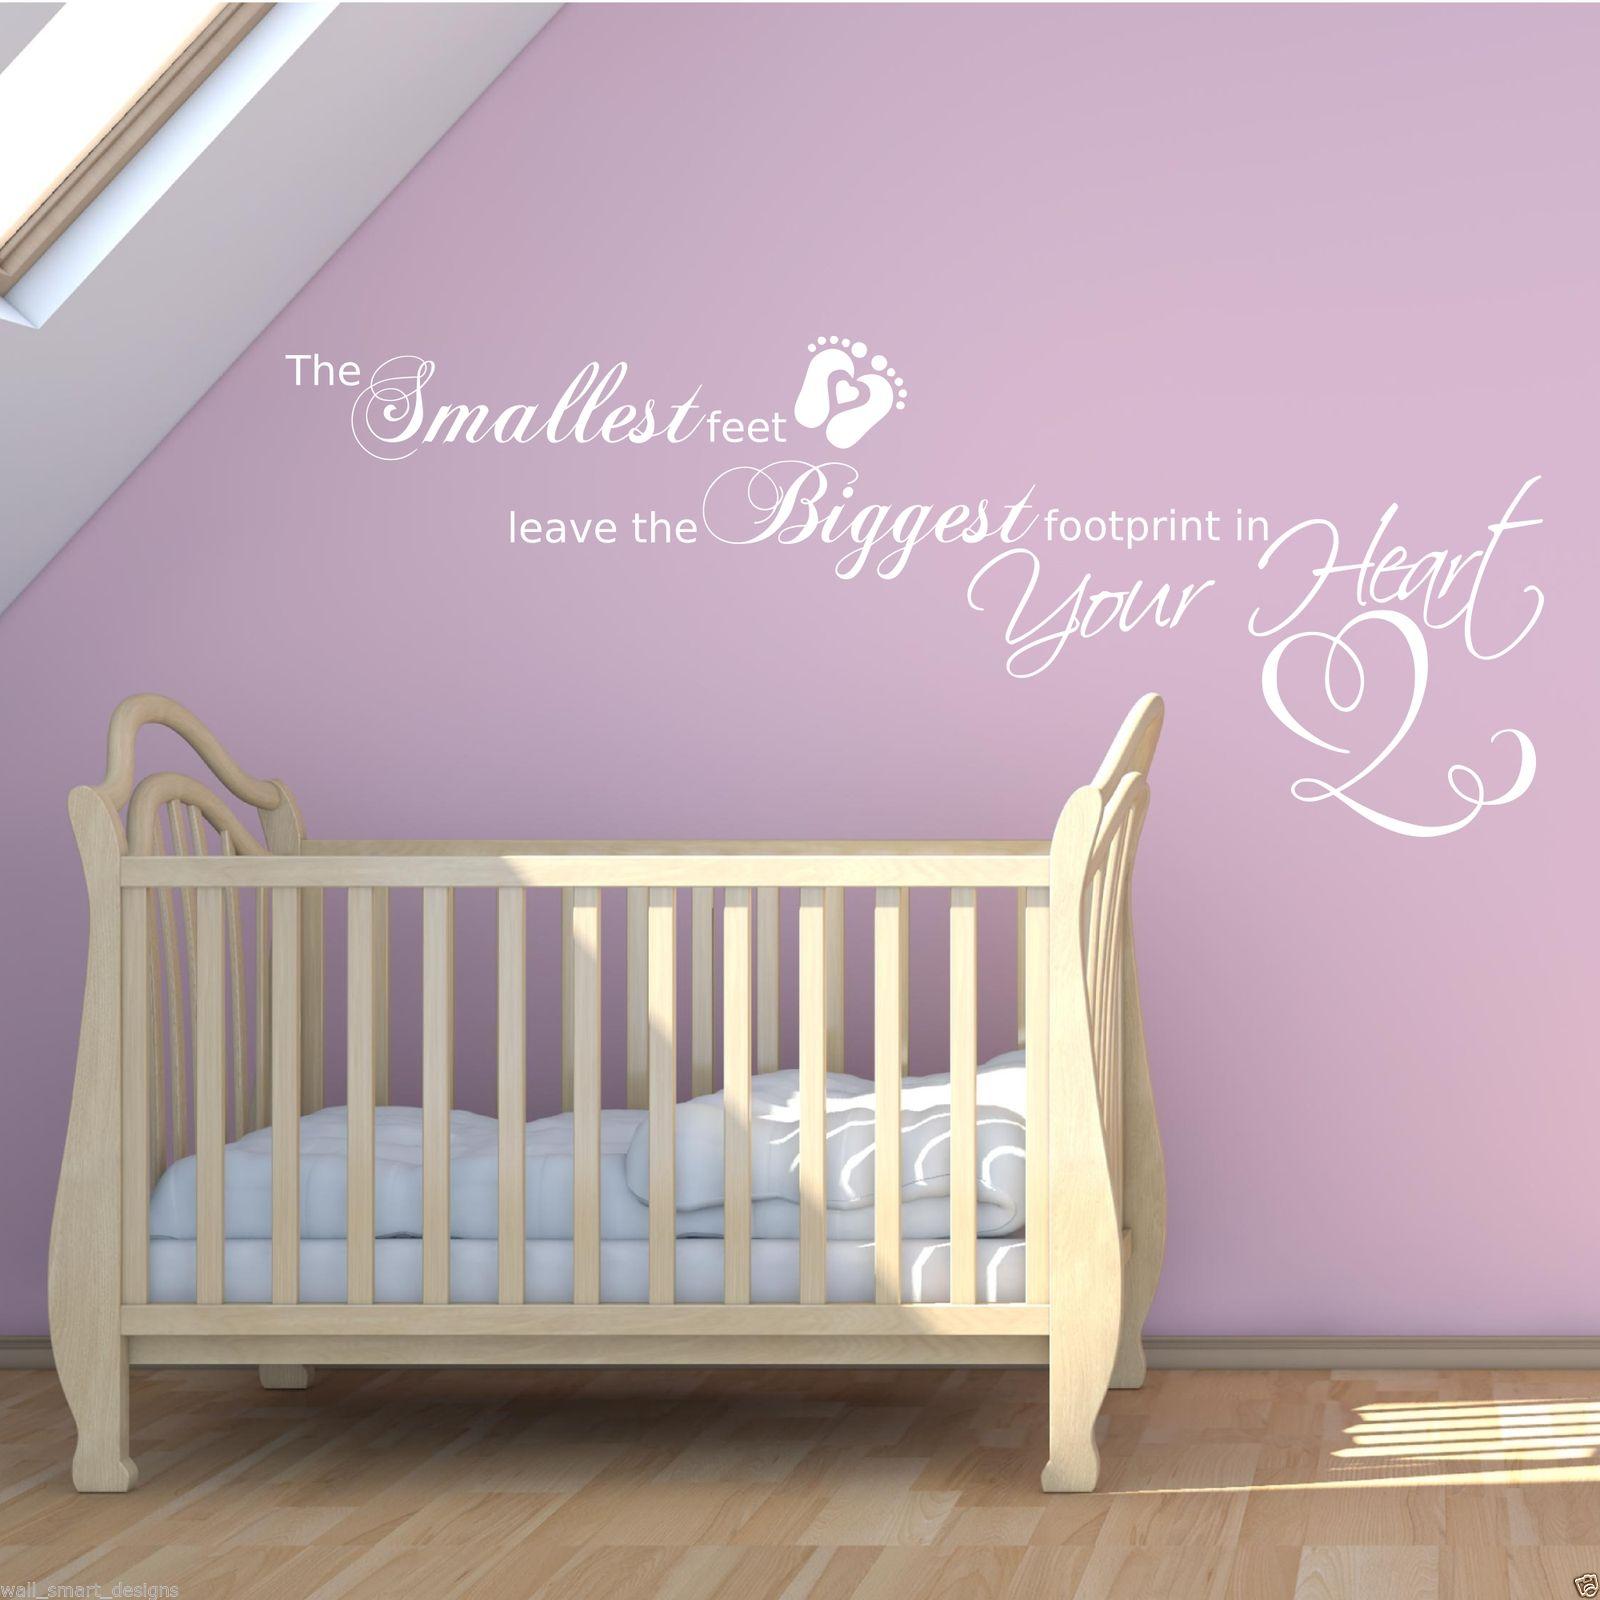 Wonderful Baby Footprints Love Heart Childrenu0027s Bedroom Wall Art Sticker Quote Decal  Mural Part 12